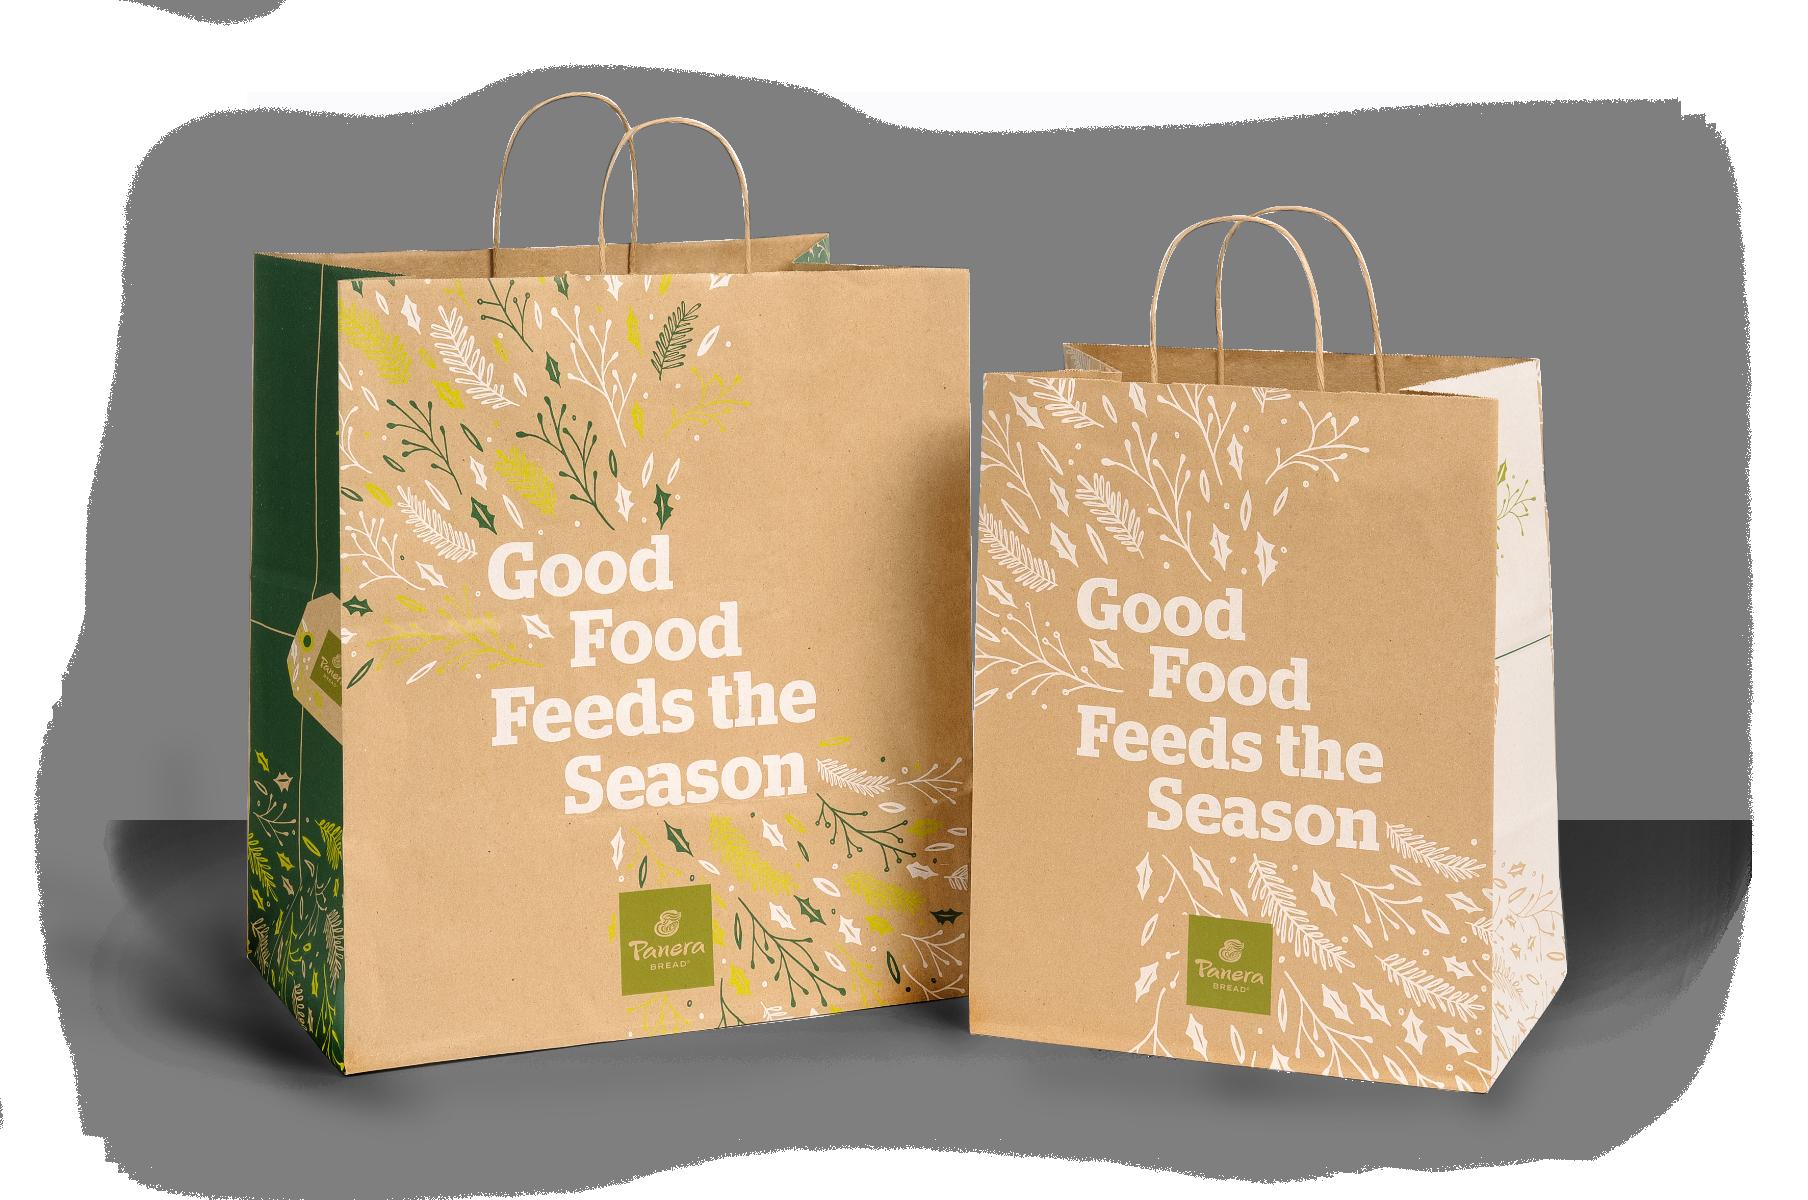 Panera Holiday 2015 Campaign - Bags